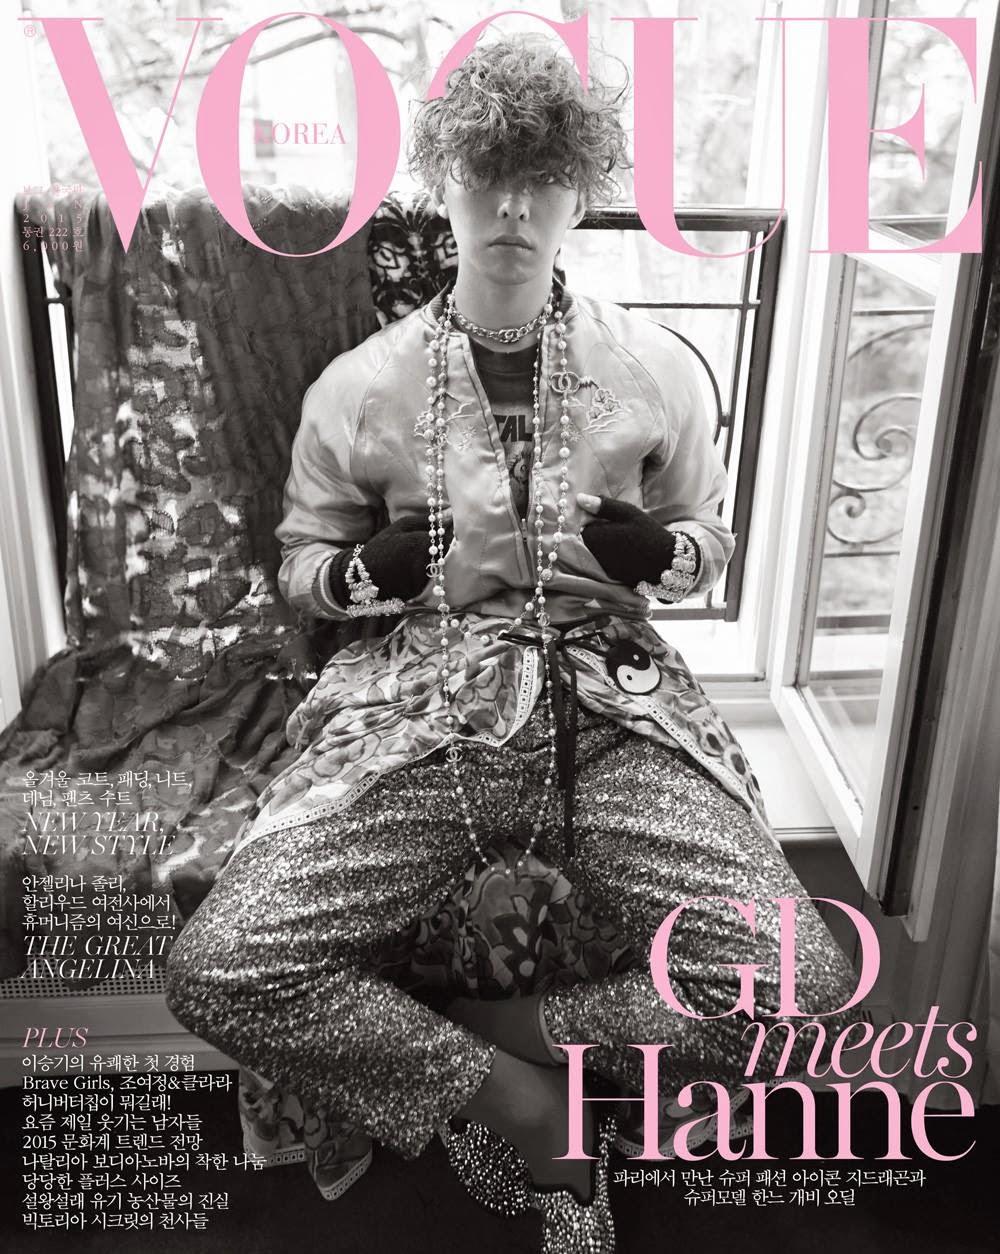 Scans: G-Dragon for Vogue Korea (January 2015) [PHOTOS]  Scans: G-Dragon for Vogue Korea (January 2015) [PHOTOS]  Scans: G-Dragon for Vogue Korea (January 2015) [PHOTOS]  Scans: G-Dragon for Vogue Korea (January 2015) [PHOTOS]  Scans: G-Dragon for Vogue Korea (January 2015) [PHOTOS]  Scans: G-Dragon for Vogue Korea (January 2015) [PHOTOS]  Scans: G-Dragon for Vogue Korea (January 2015) [PHOTOS]  Scans: G-Dragon for Vogue Korea (January 2015) [PHOTOS]  Scans: G-Dragon for Vogue Korea (January 2015) [PHOTOS]  Scans: G-Dragon for Vogue Korea (January 2015) [PHOTOS]  Scans: G-Dragon for Vogue Korea (January 2015) [PHOTOS]  Scans: G-Dragon for Vogue Korea (January 2015) [PHOTOS]  Scans: G-Dragon for Vogue Korea (January 2015) [PHOTOS]